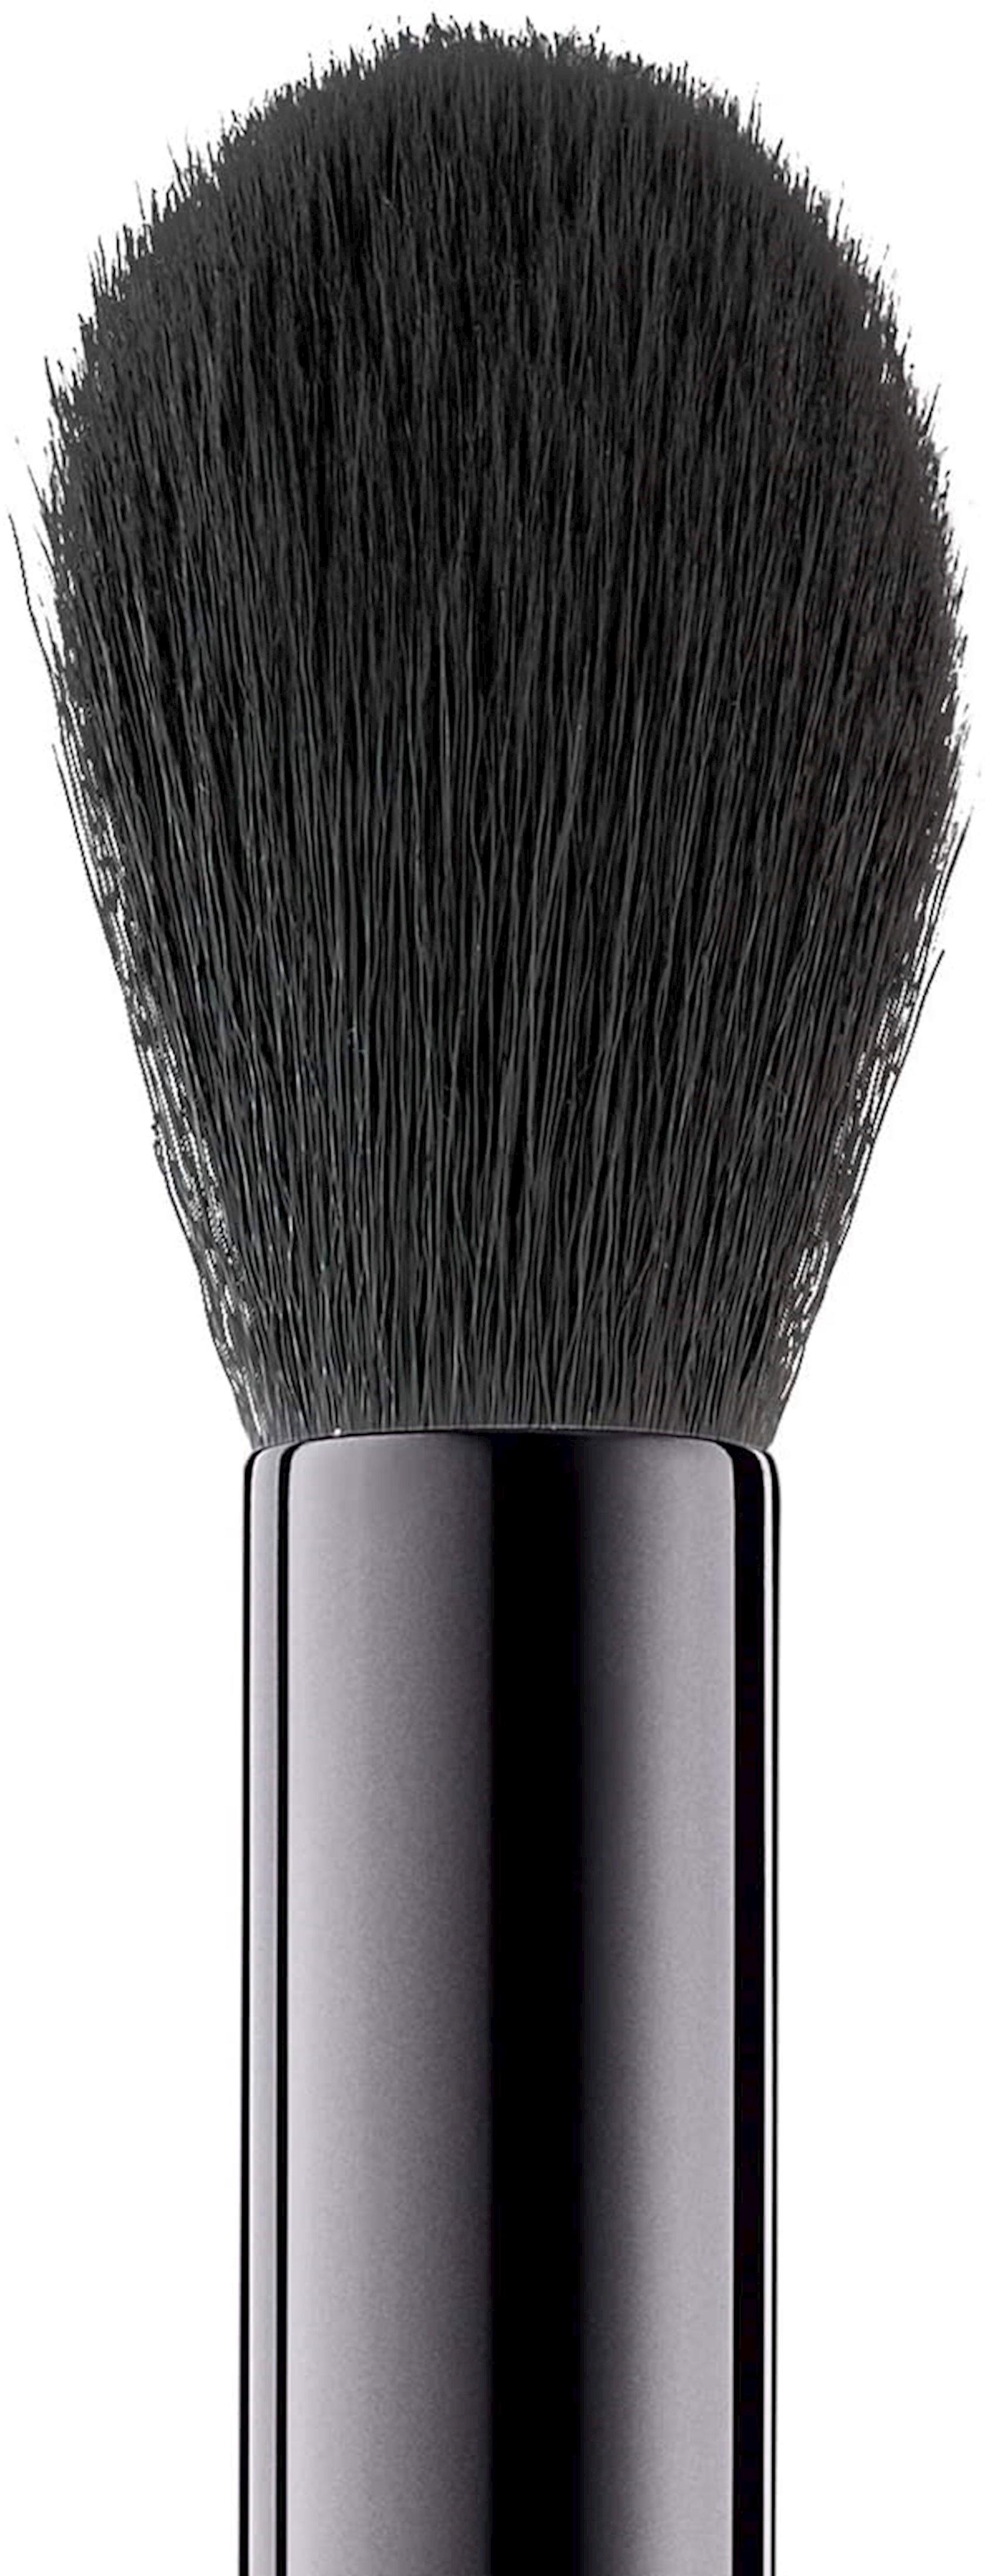 Xaylayter üçün fırça E.L.F. Highlighting Brush